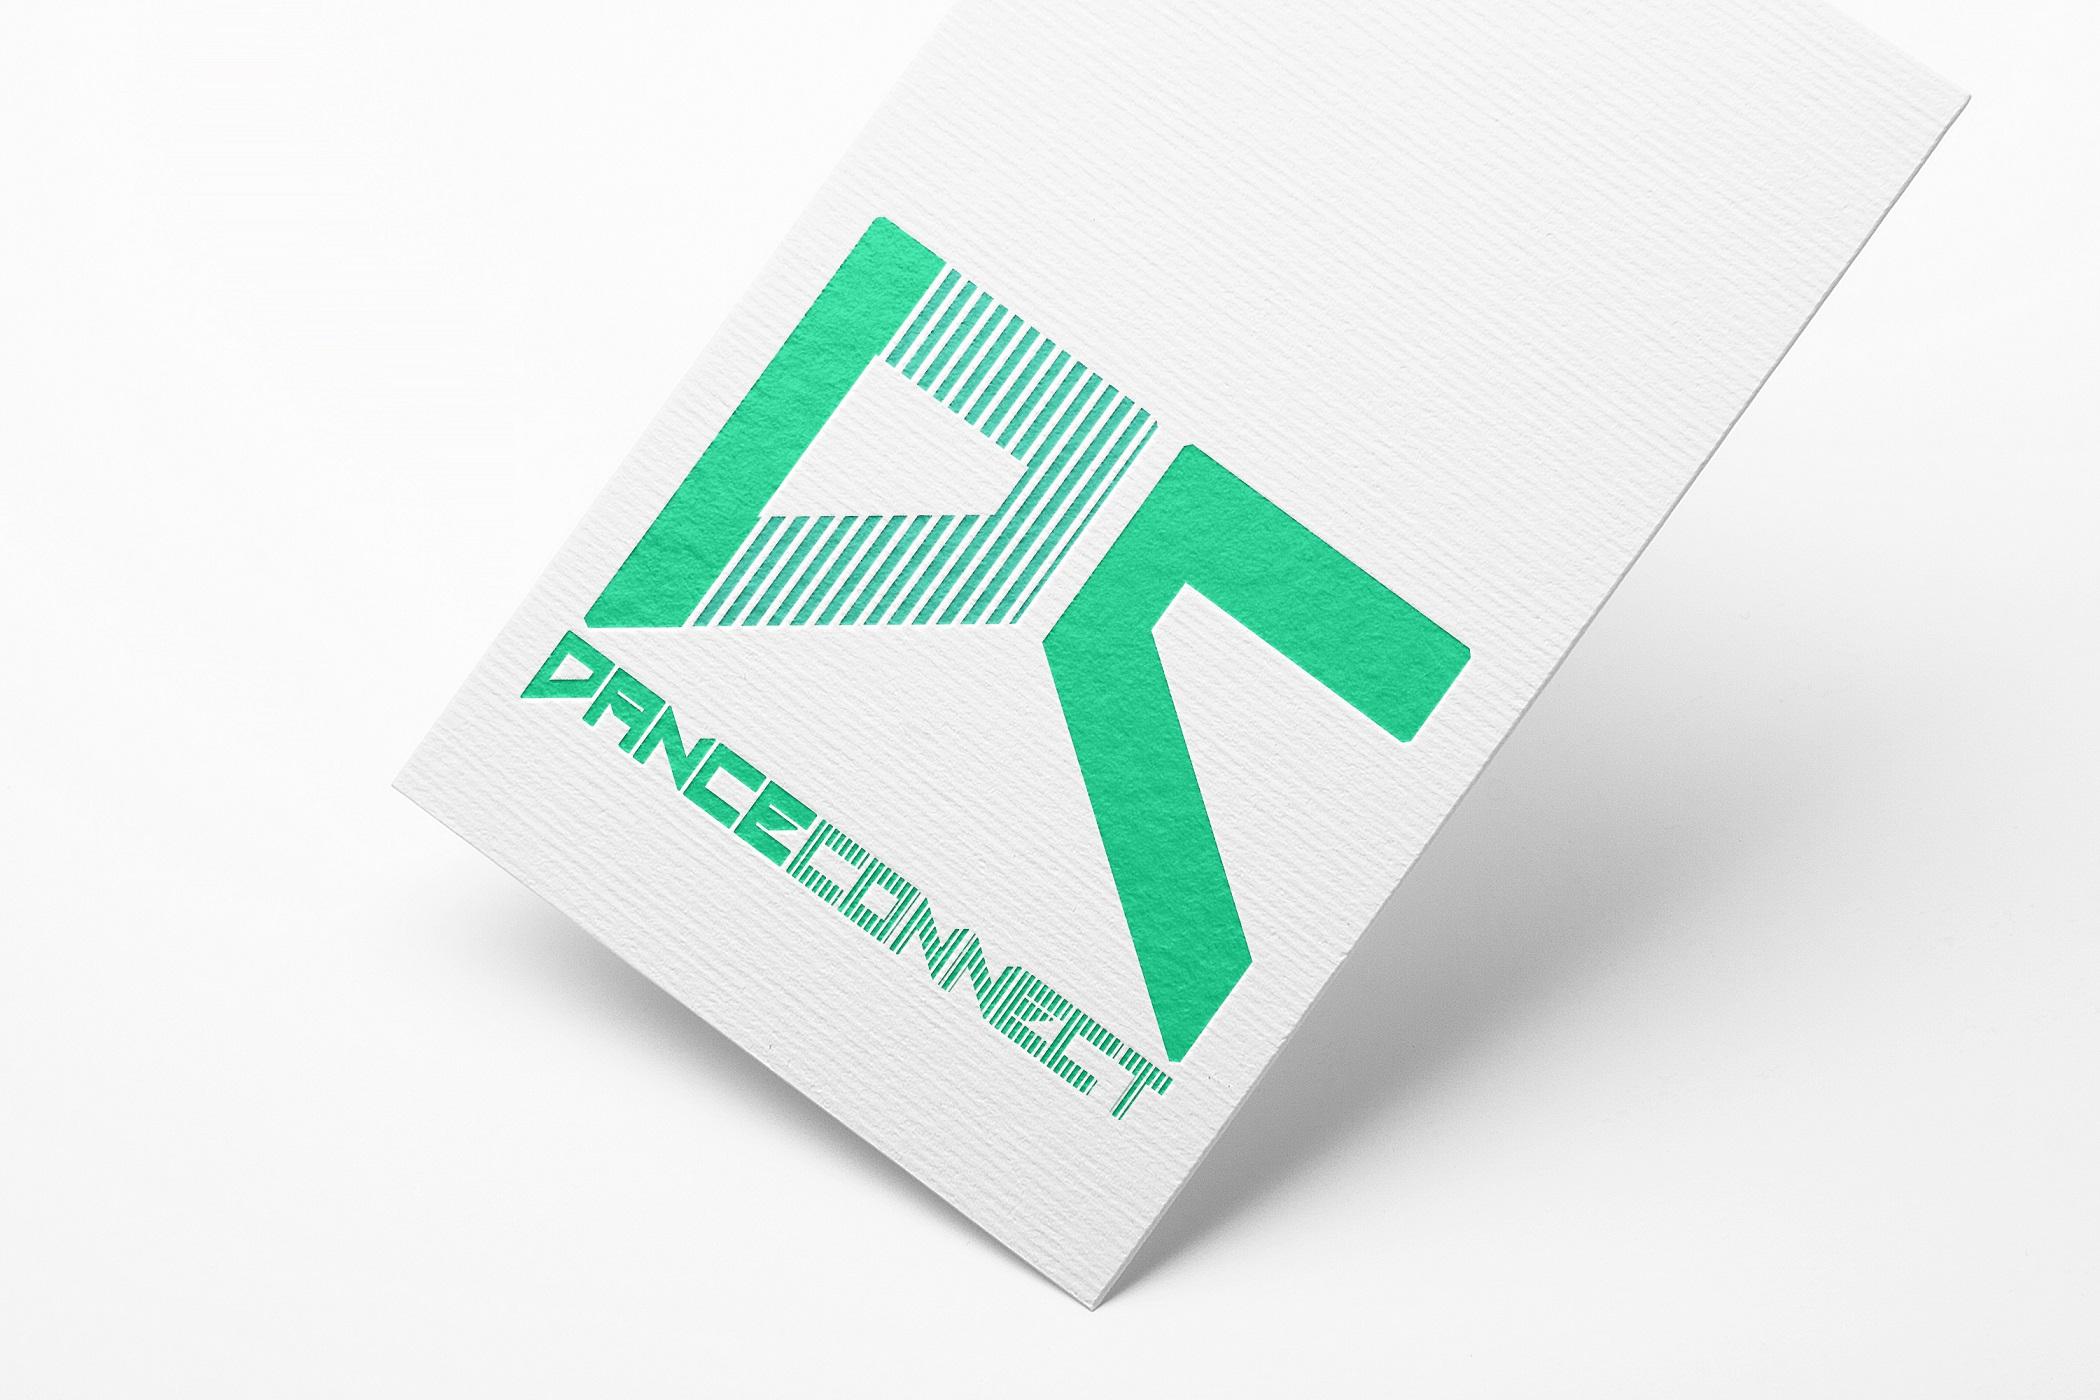 Разработка лого для спортивного портала www.danceconnect.ru фото f_1095b3f5d4da9fa0.jpg